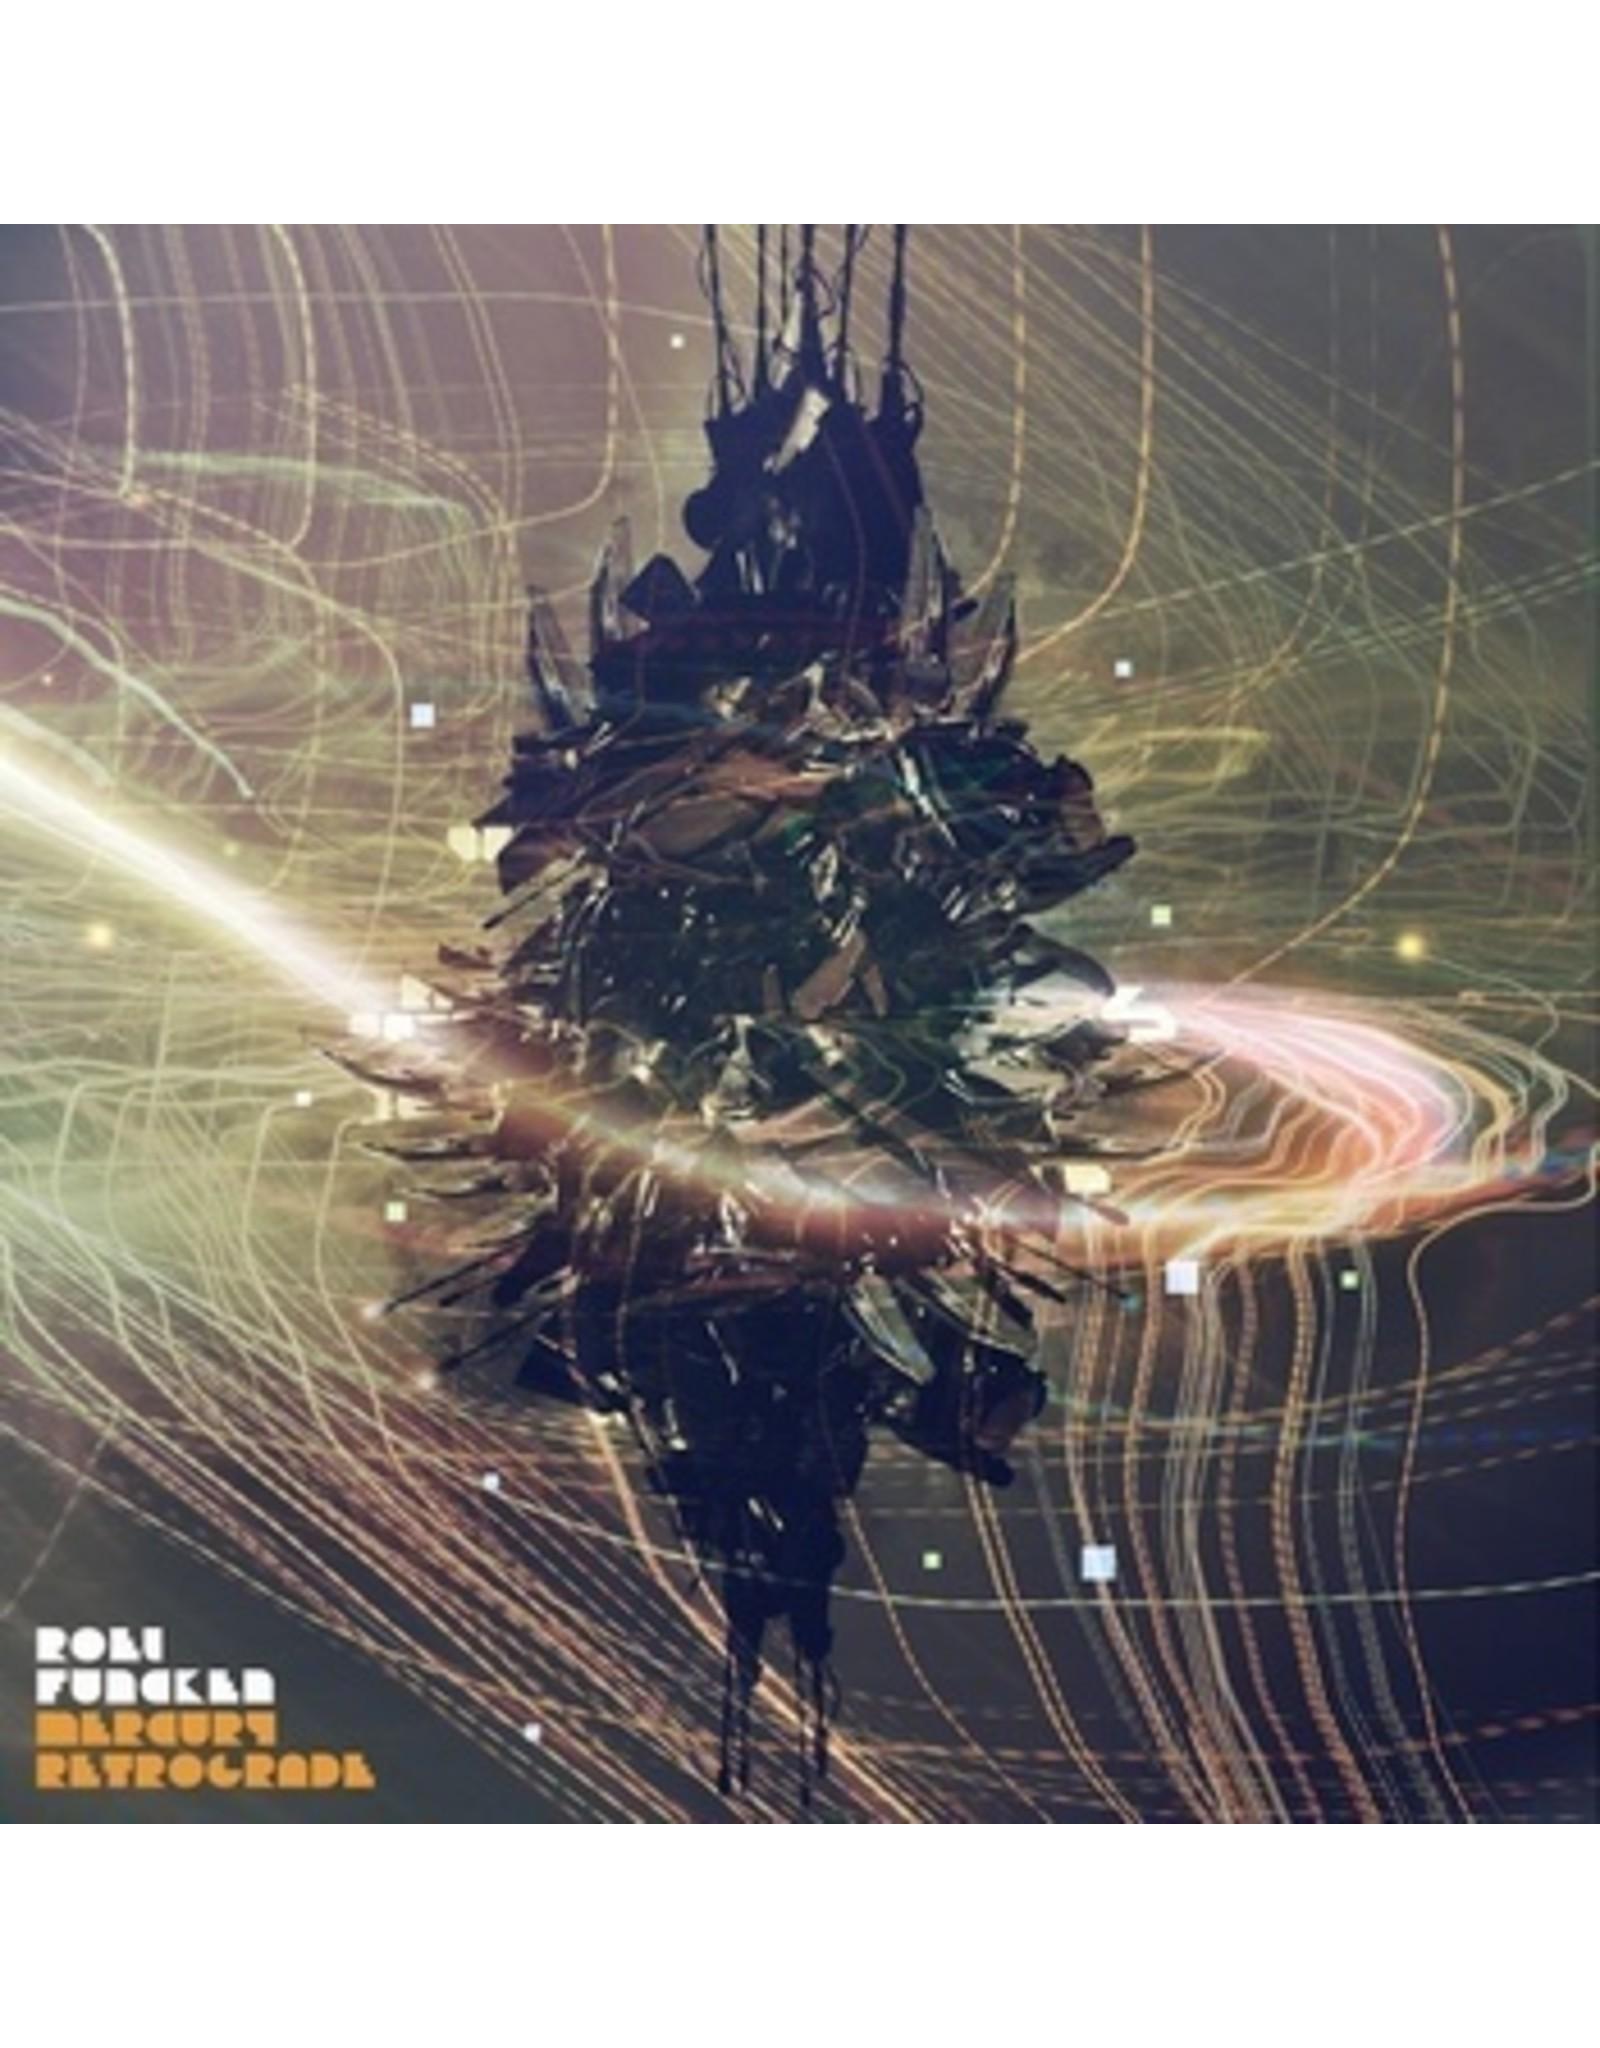 New Vinyl Roel Funcken - Mercury Retrograde LP